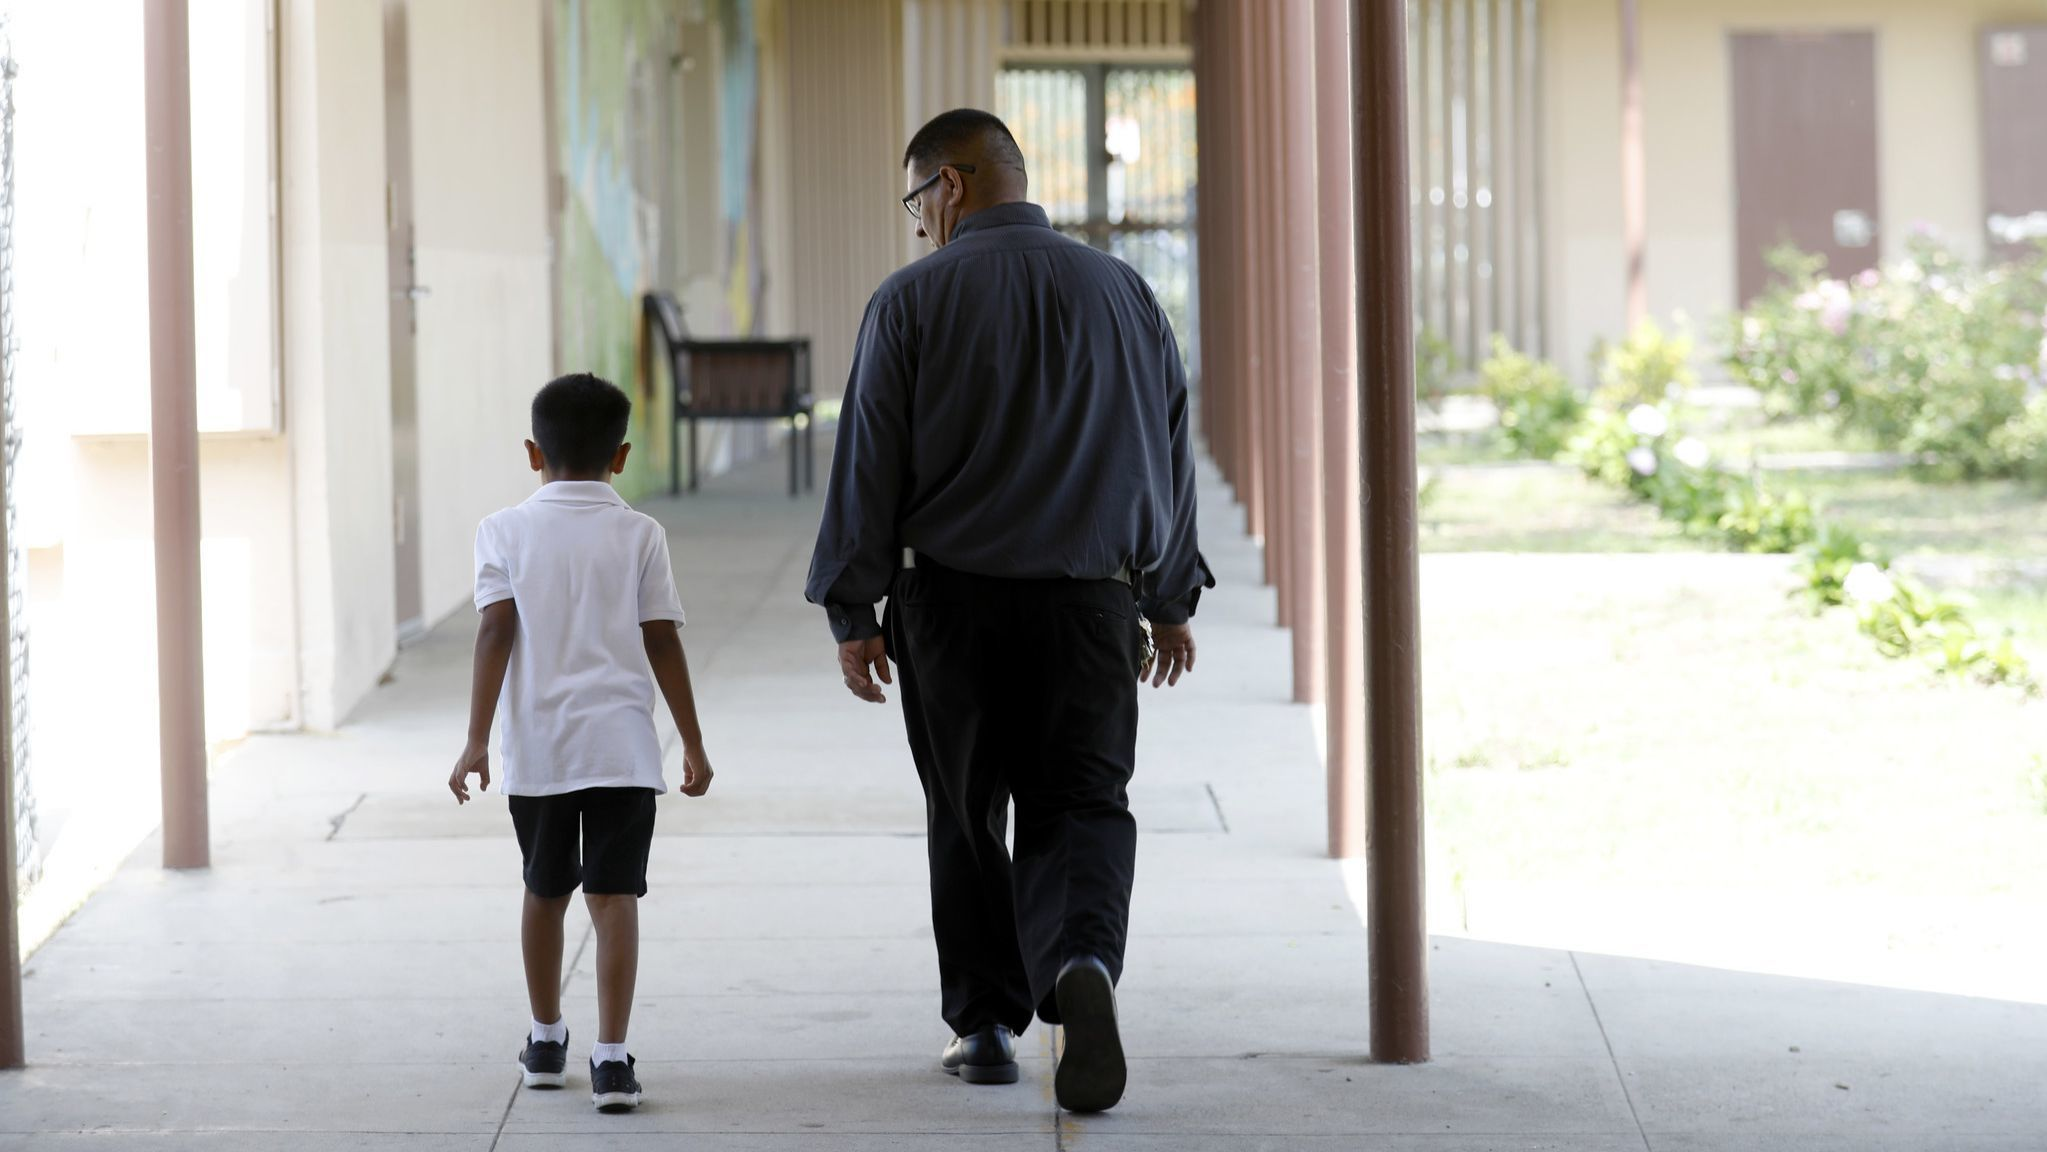 Principal Jose Razo walks with a student